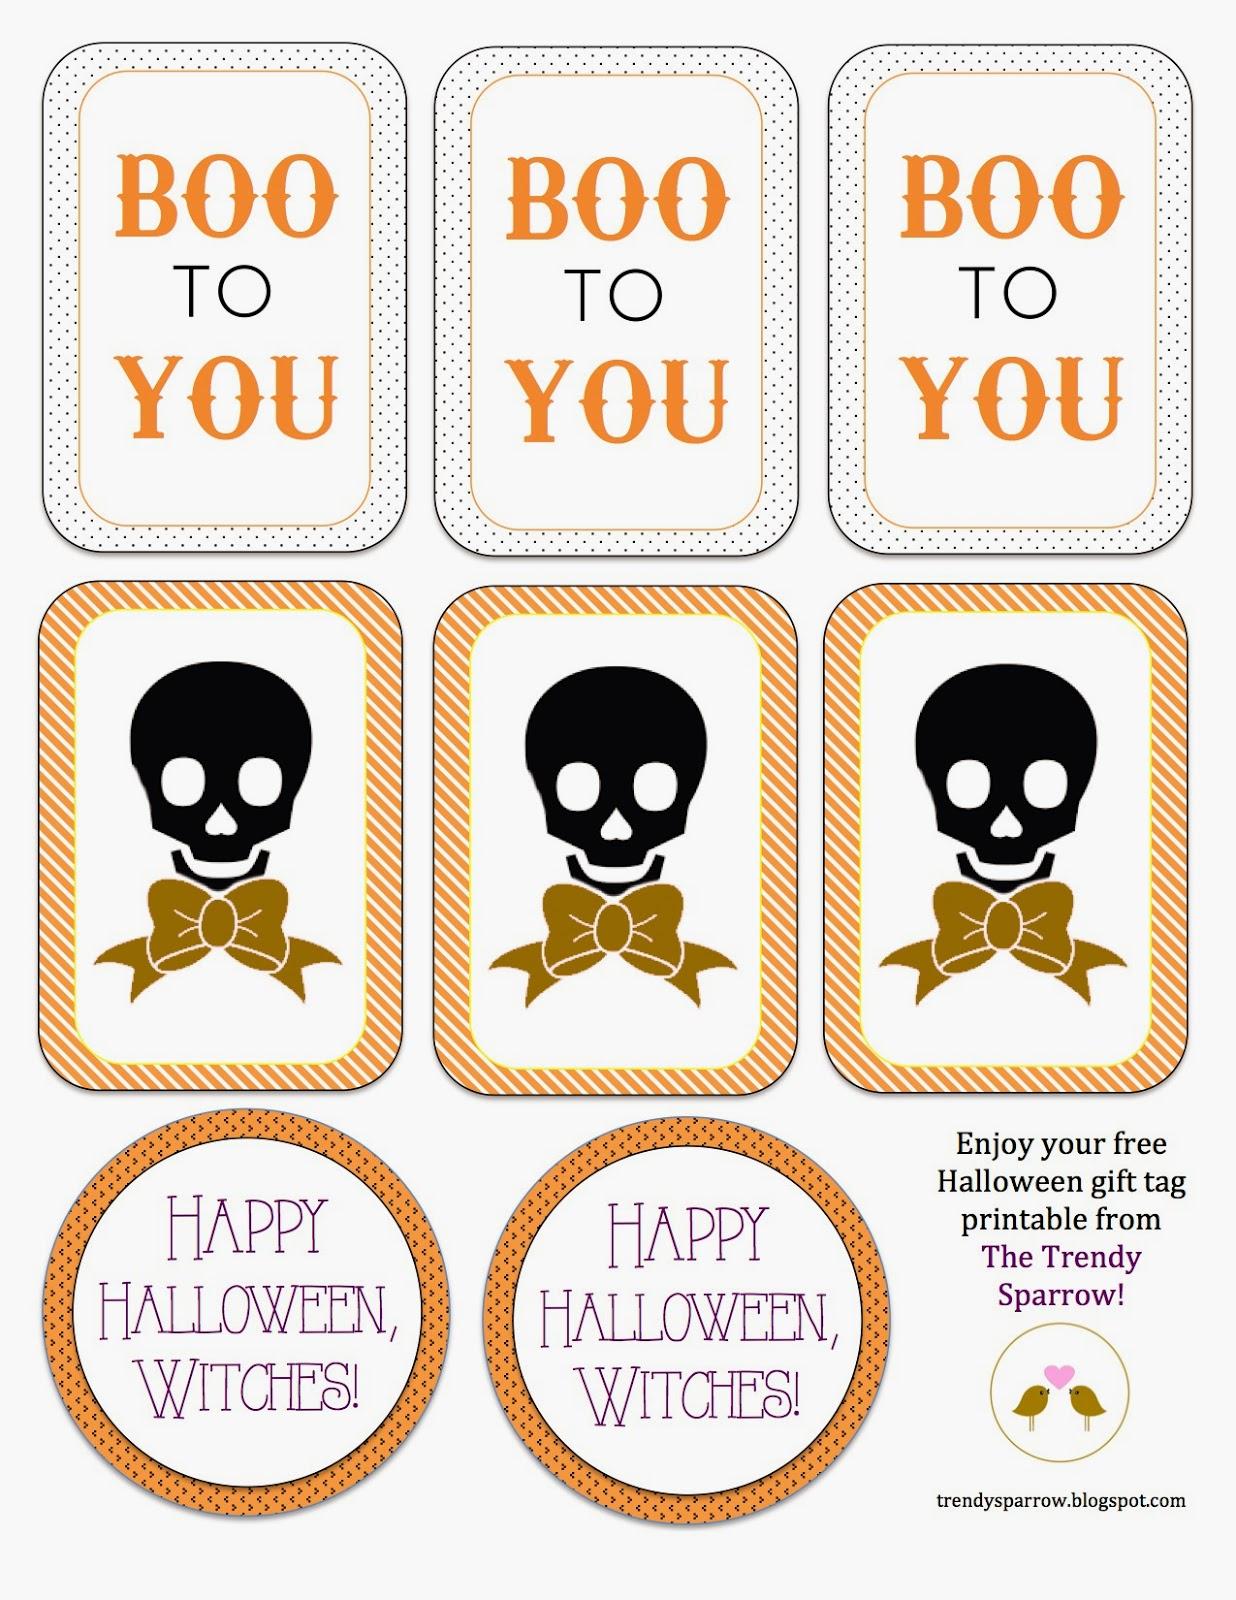 photograph regarding Printable Halloween Gift Tags identify The Elegant Sparrow: Totally free Printable: Halloween Reward Tags